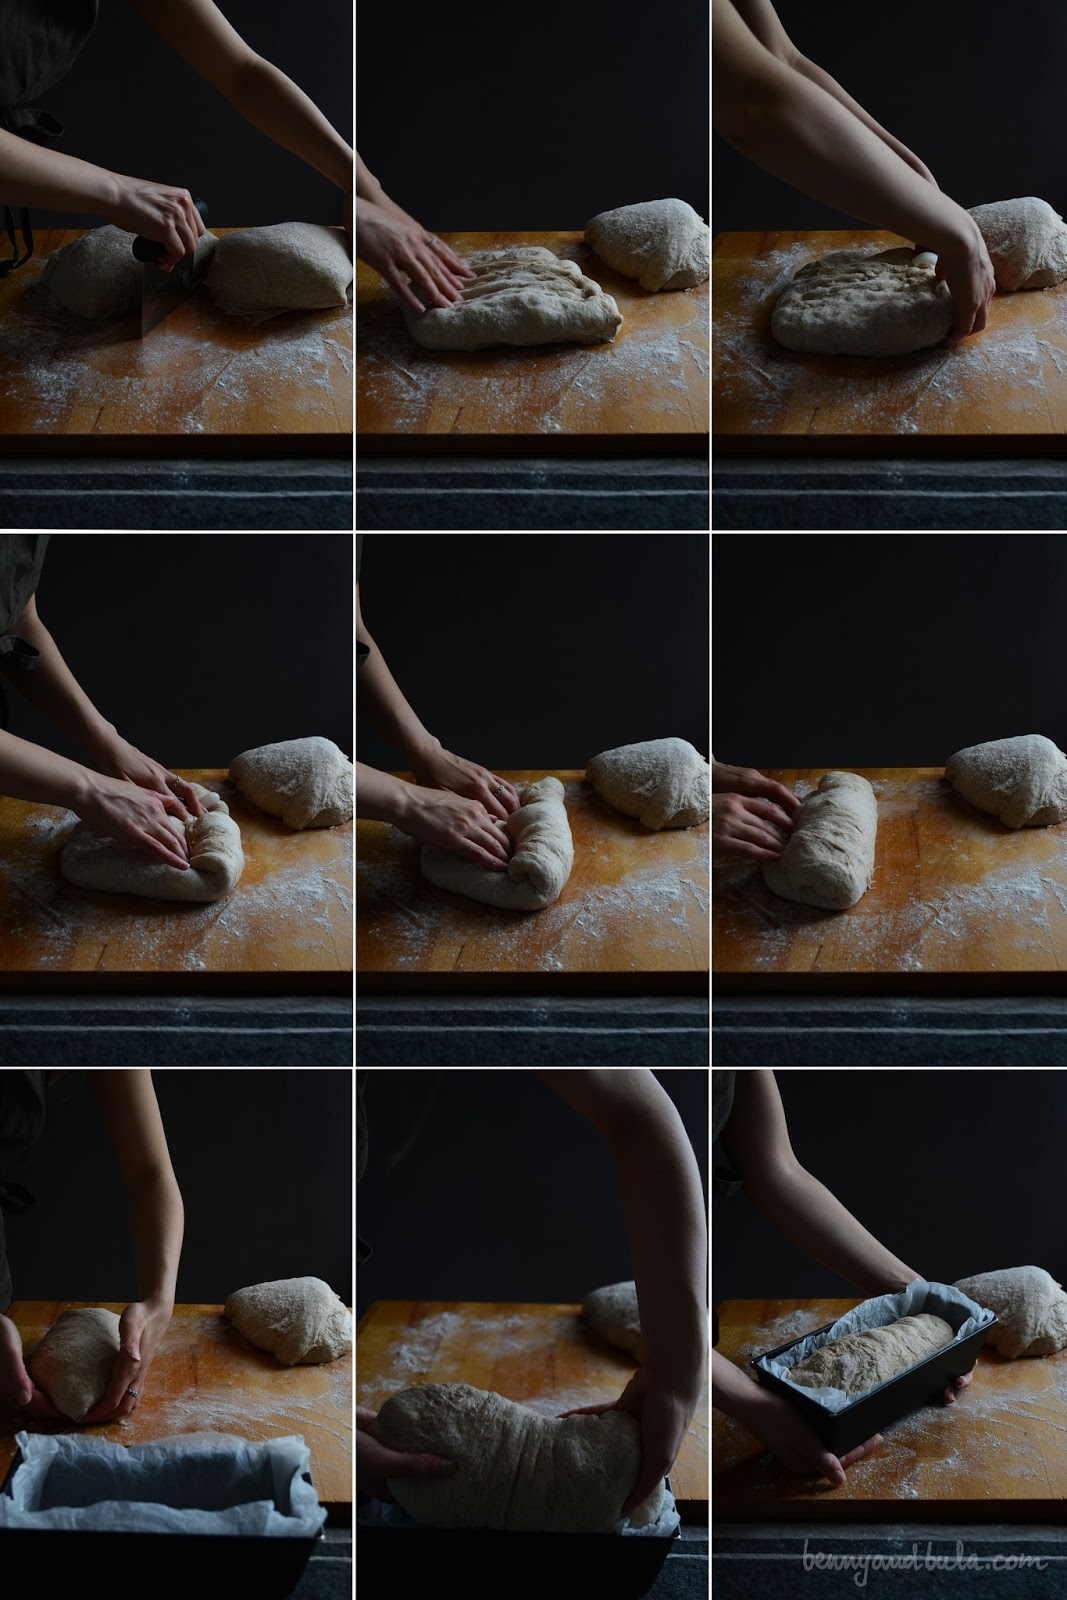 fette biscottate al malto d'orzo/ vegan barley malt toasts